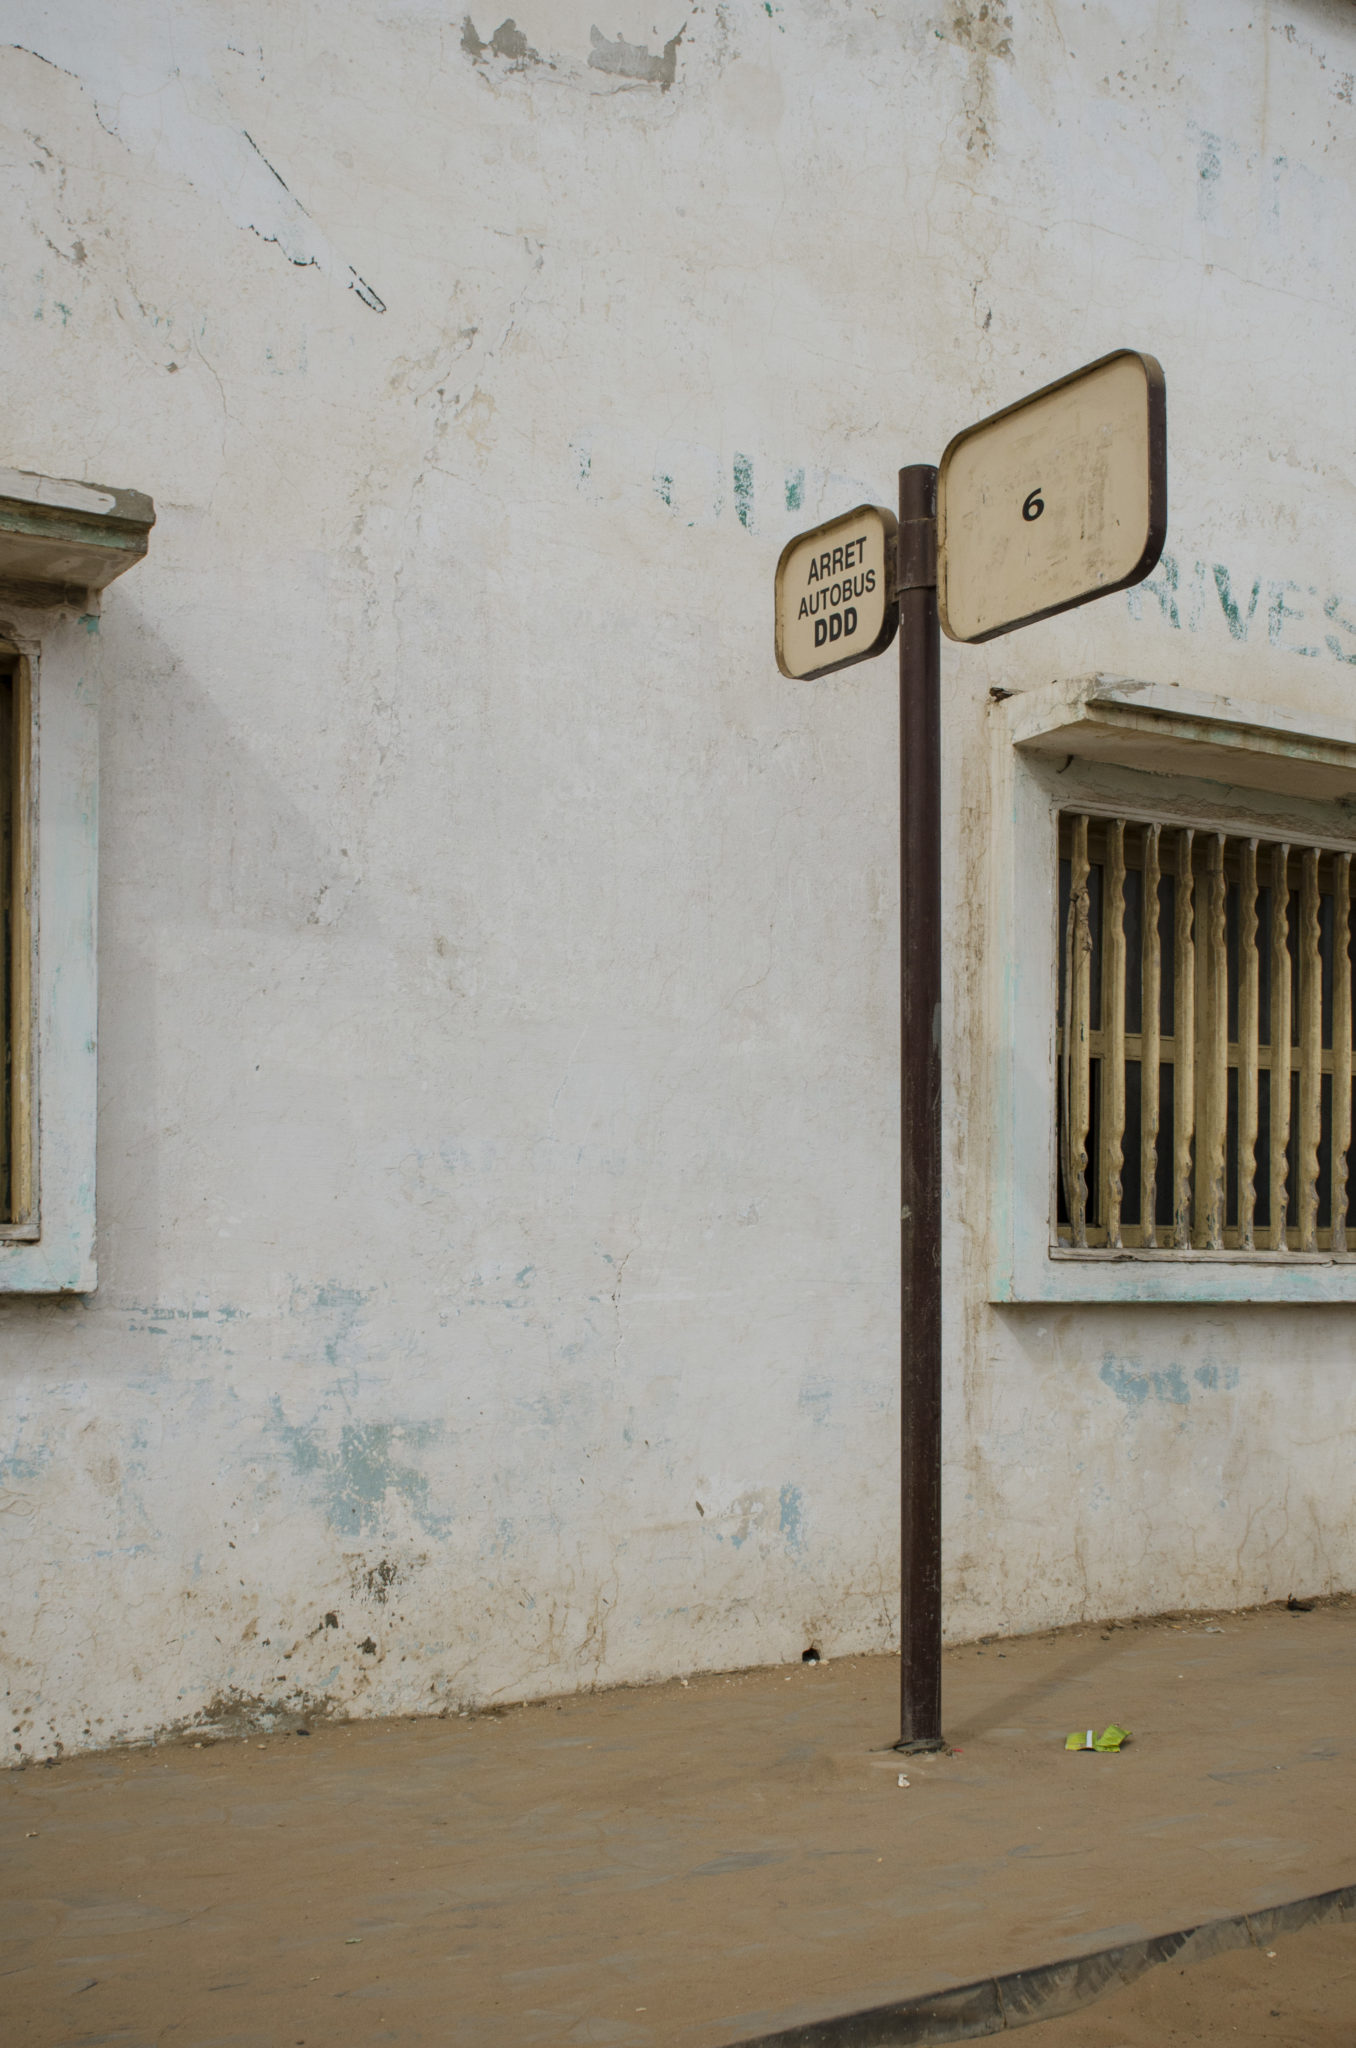 Mbour-Petite-Cote-Senegal-bus-stop